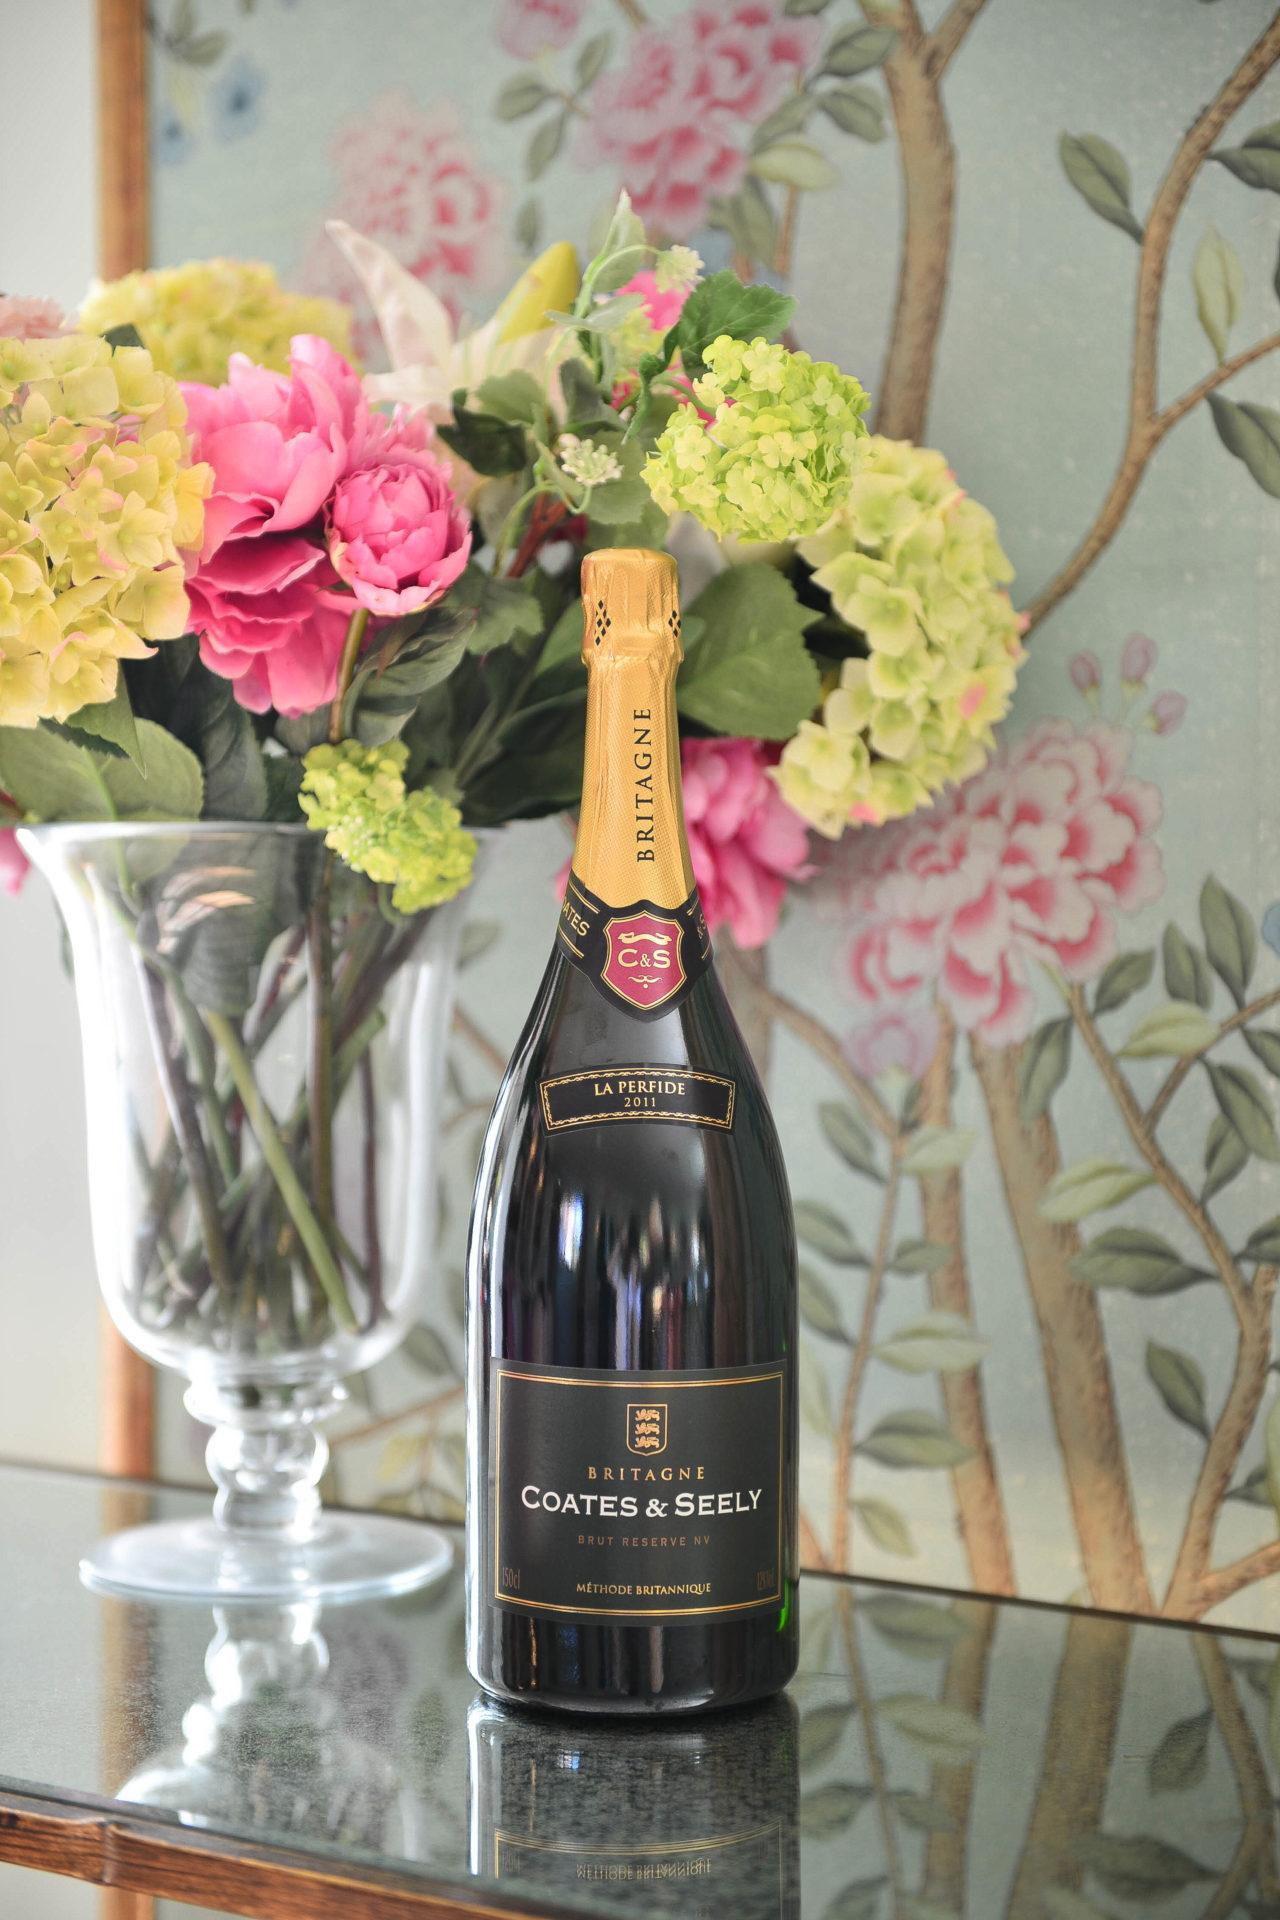 Sparkling Wine Trophy winner Coates & Seely